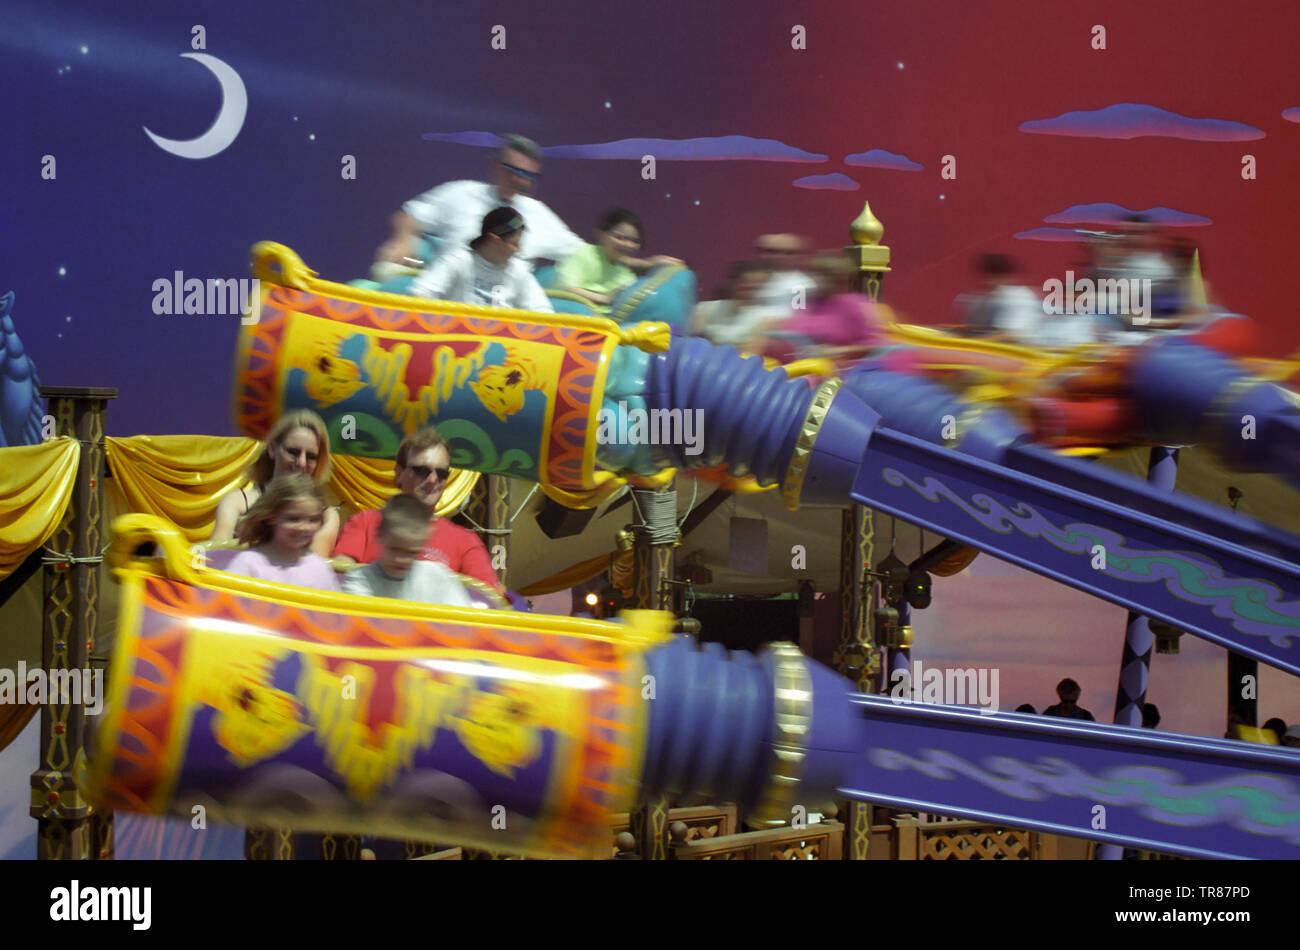 Agrabah Aladdin Stock Photos Agrabah Aladdin Stock Images Alamy